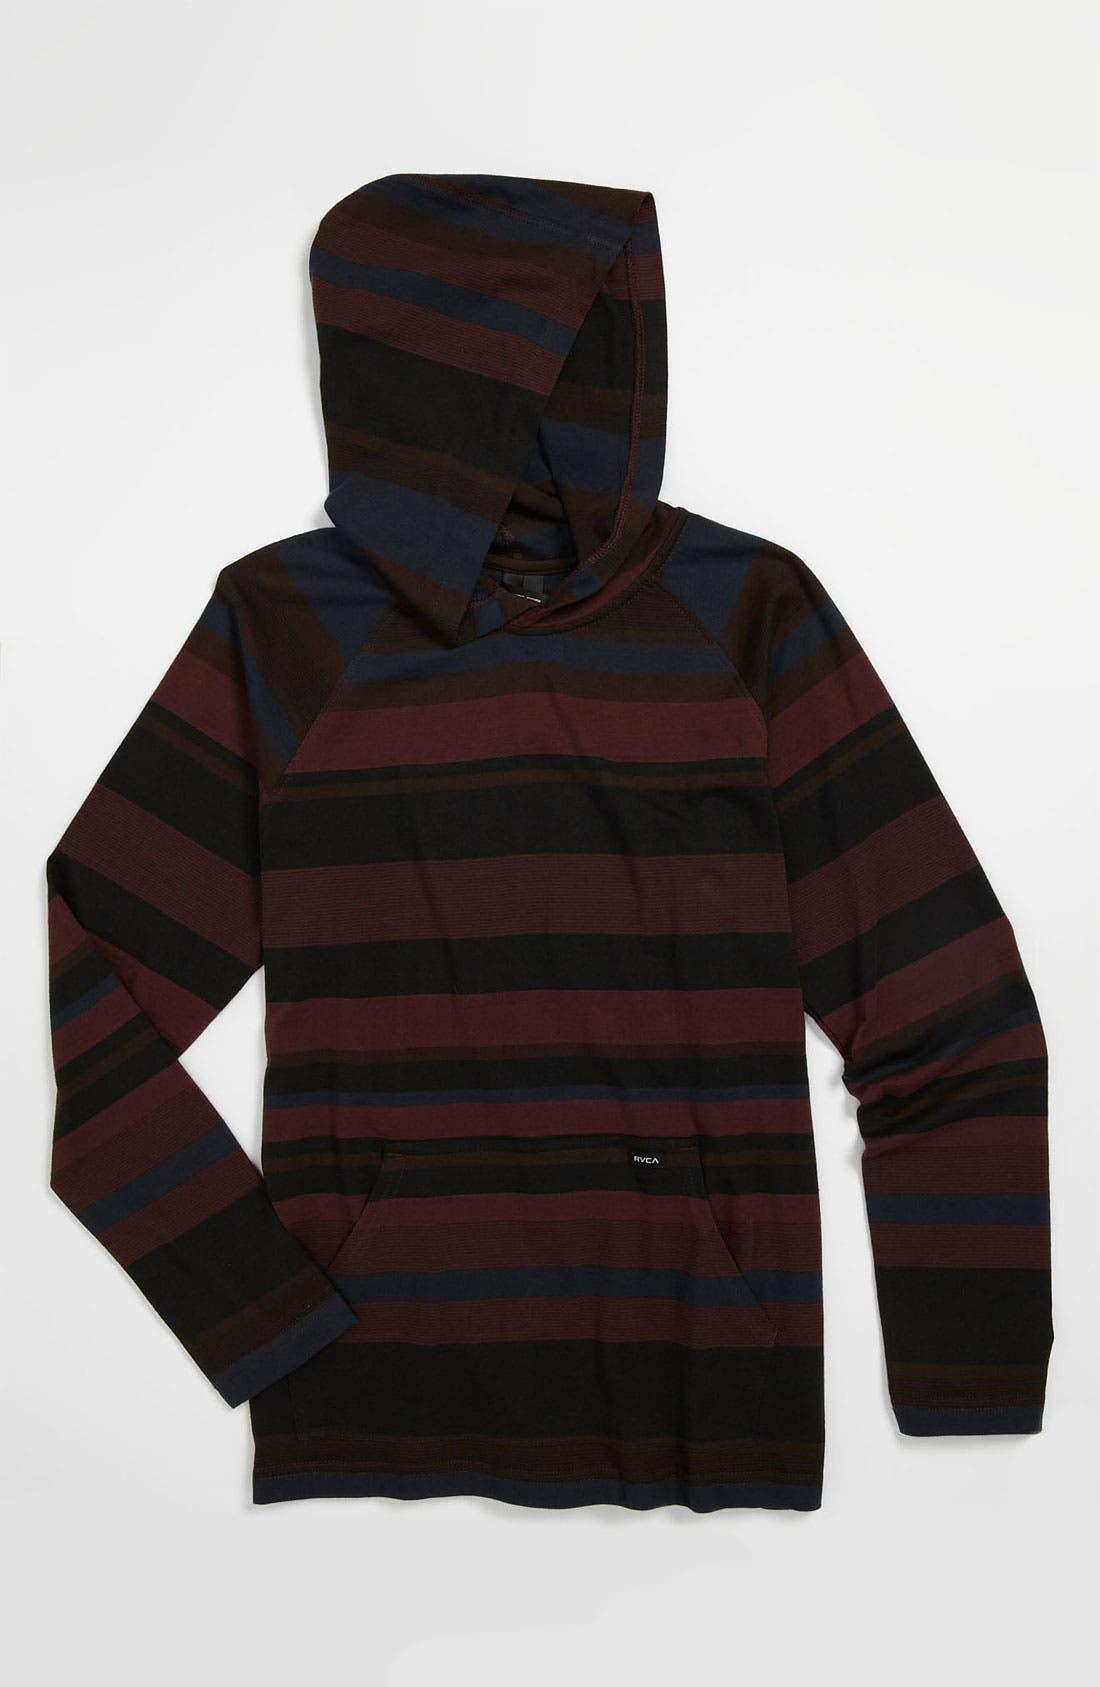 Alternate Image 1 Selected - RVCA 'Adirondak' Hooded Knit Shirt (Big Boys)